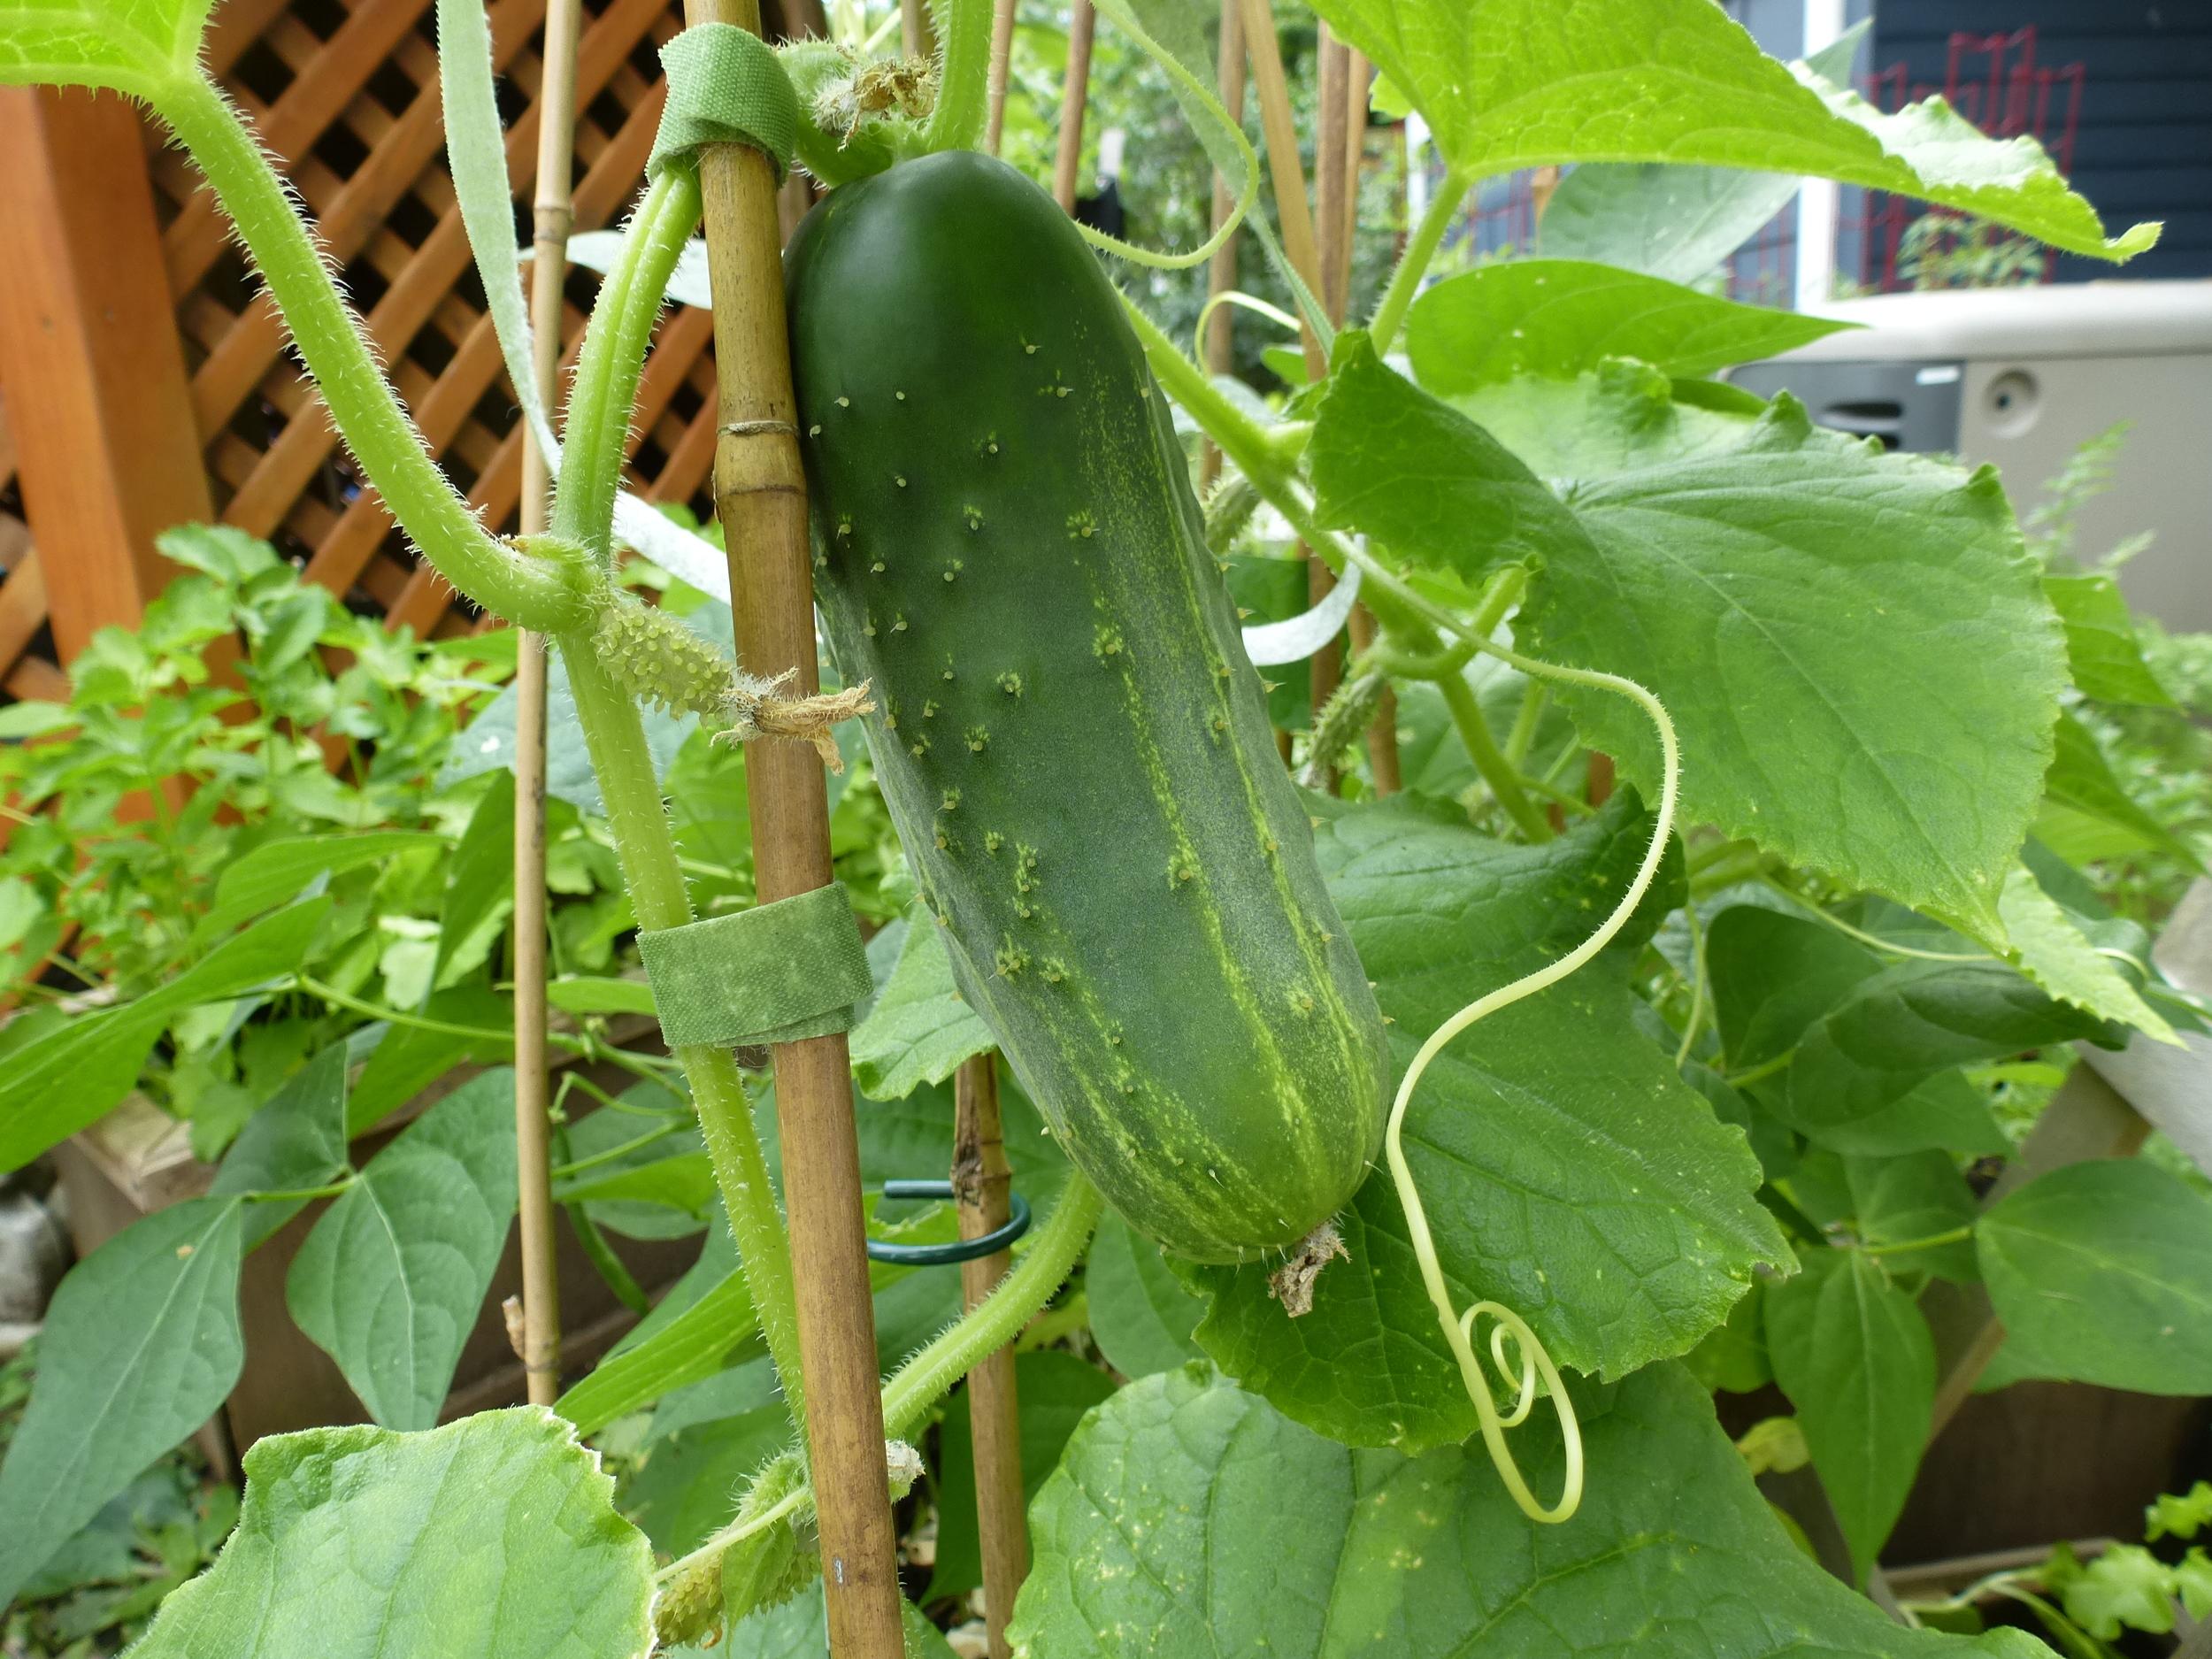 Cucumber that did pollinate